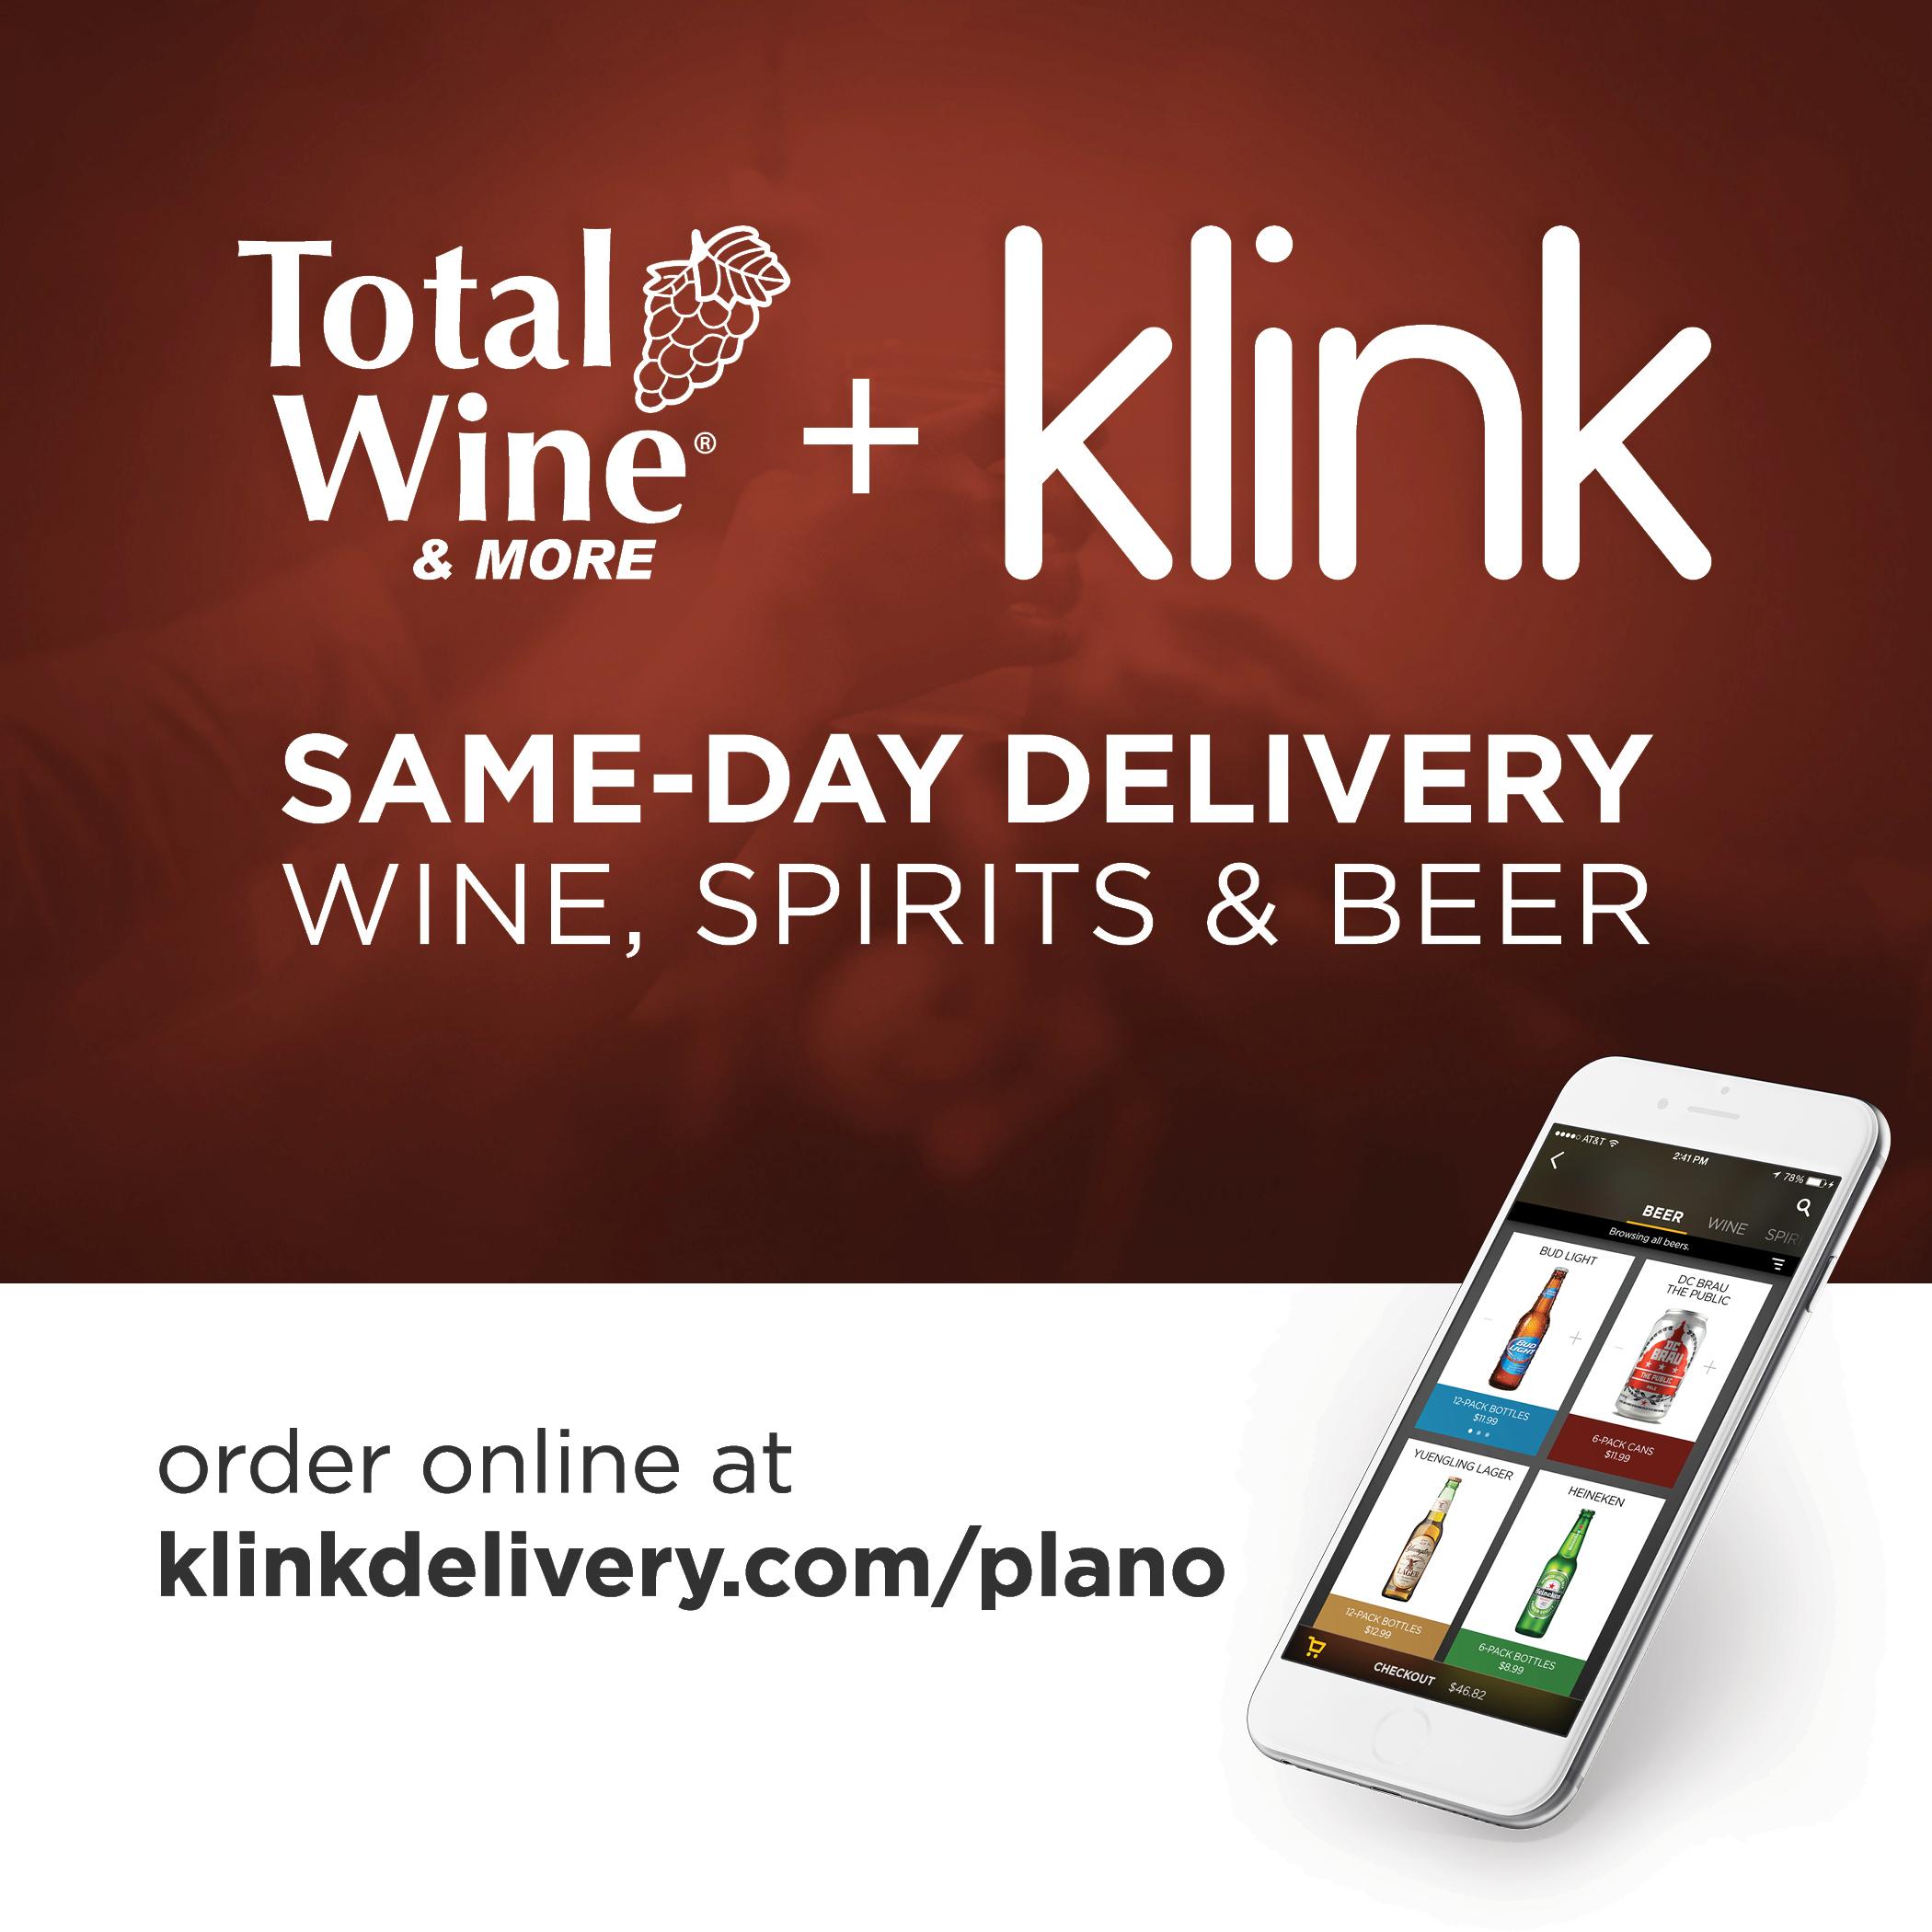 Klink_7x7_new